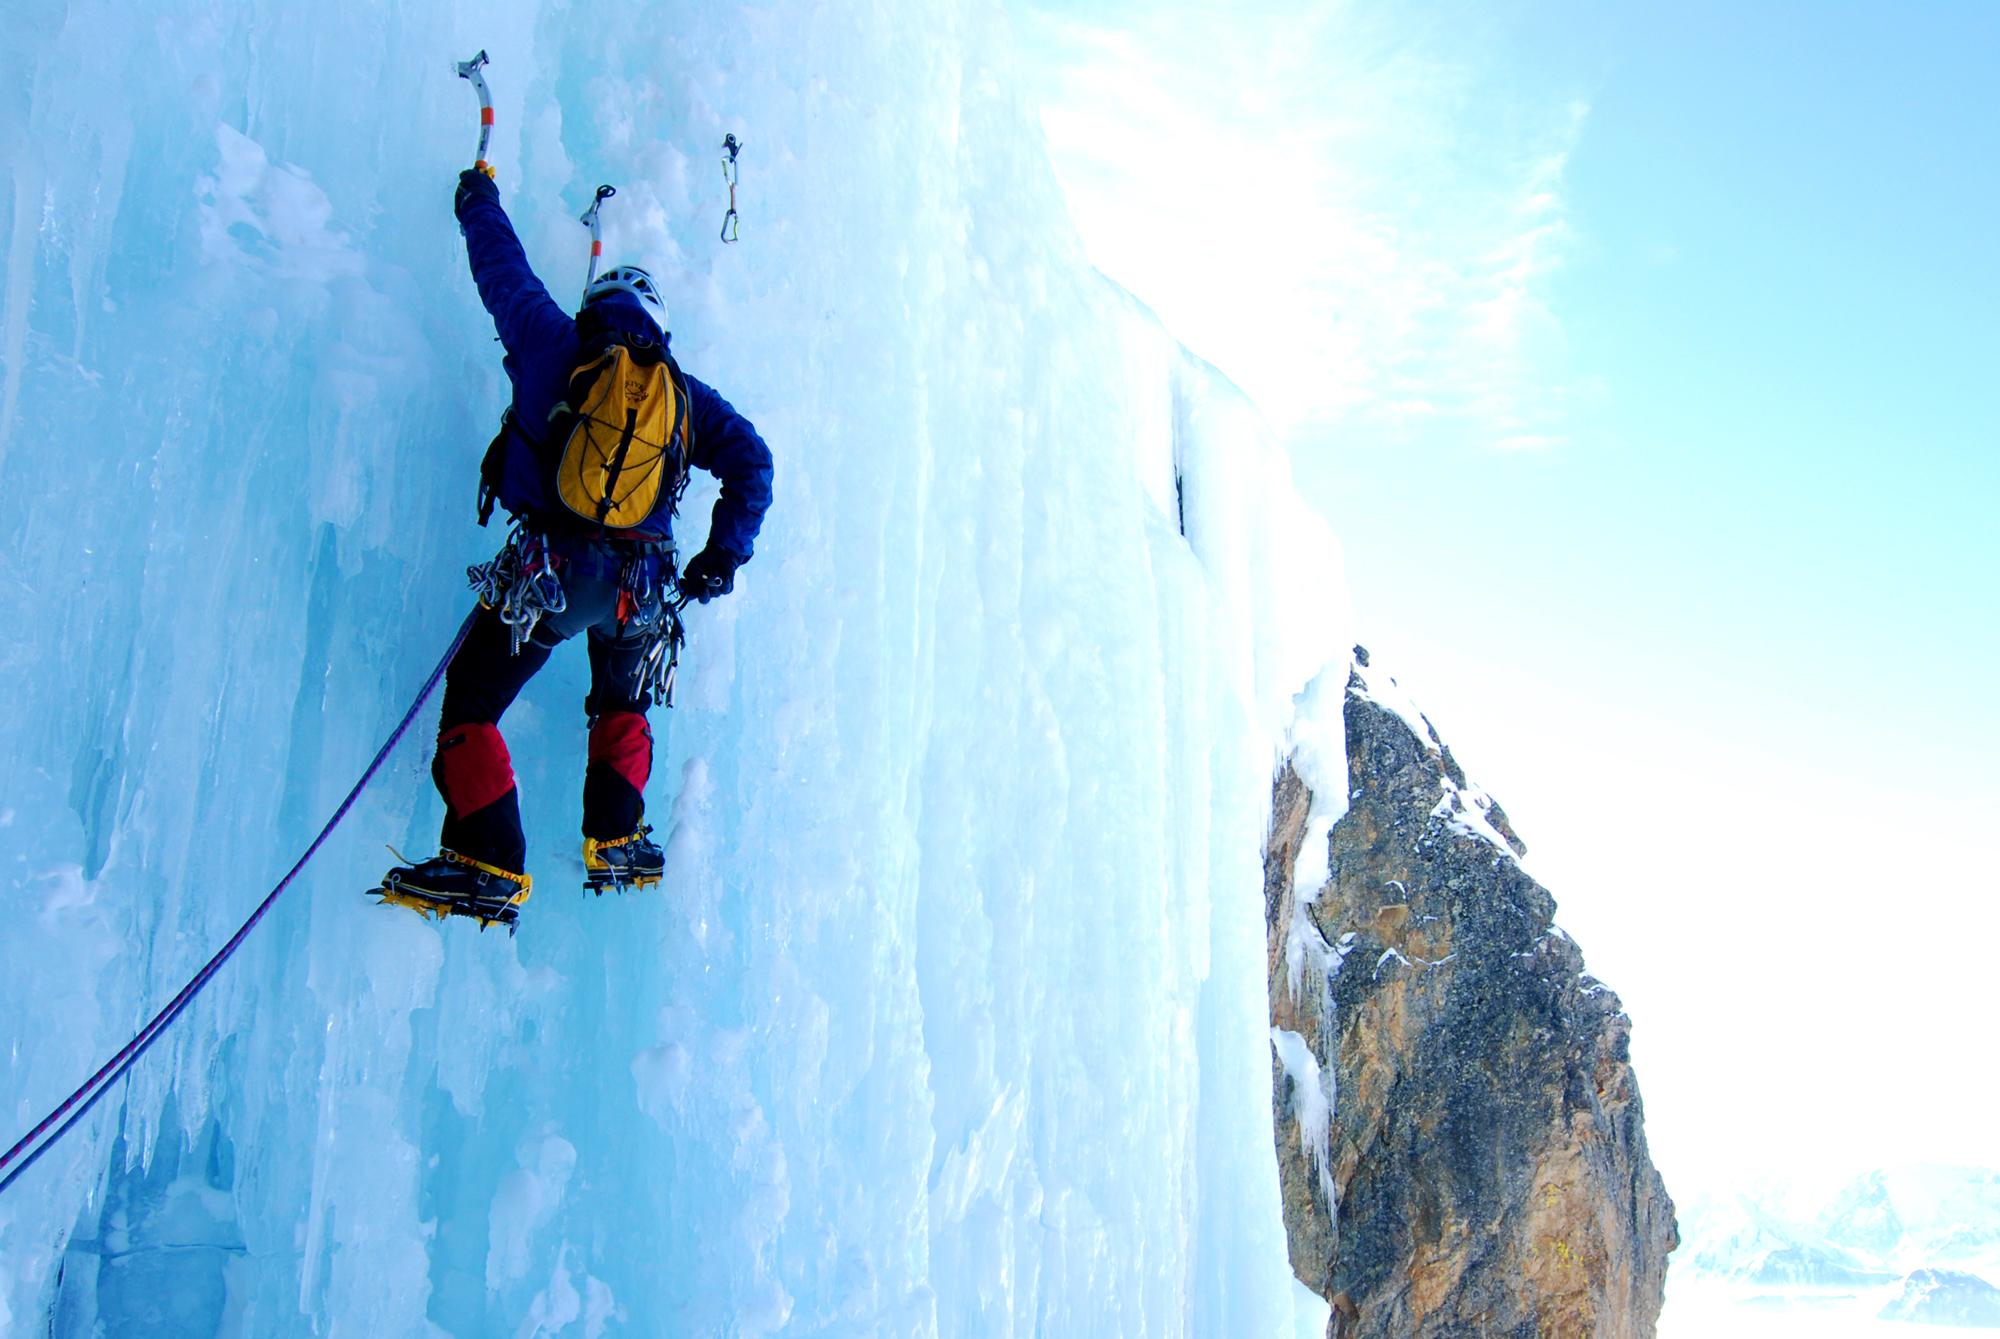 Ice_climbing_-_Symphonie_d'automne.jpg